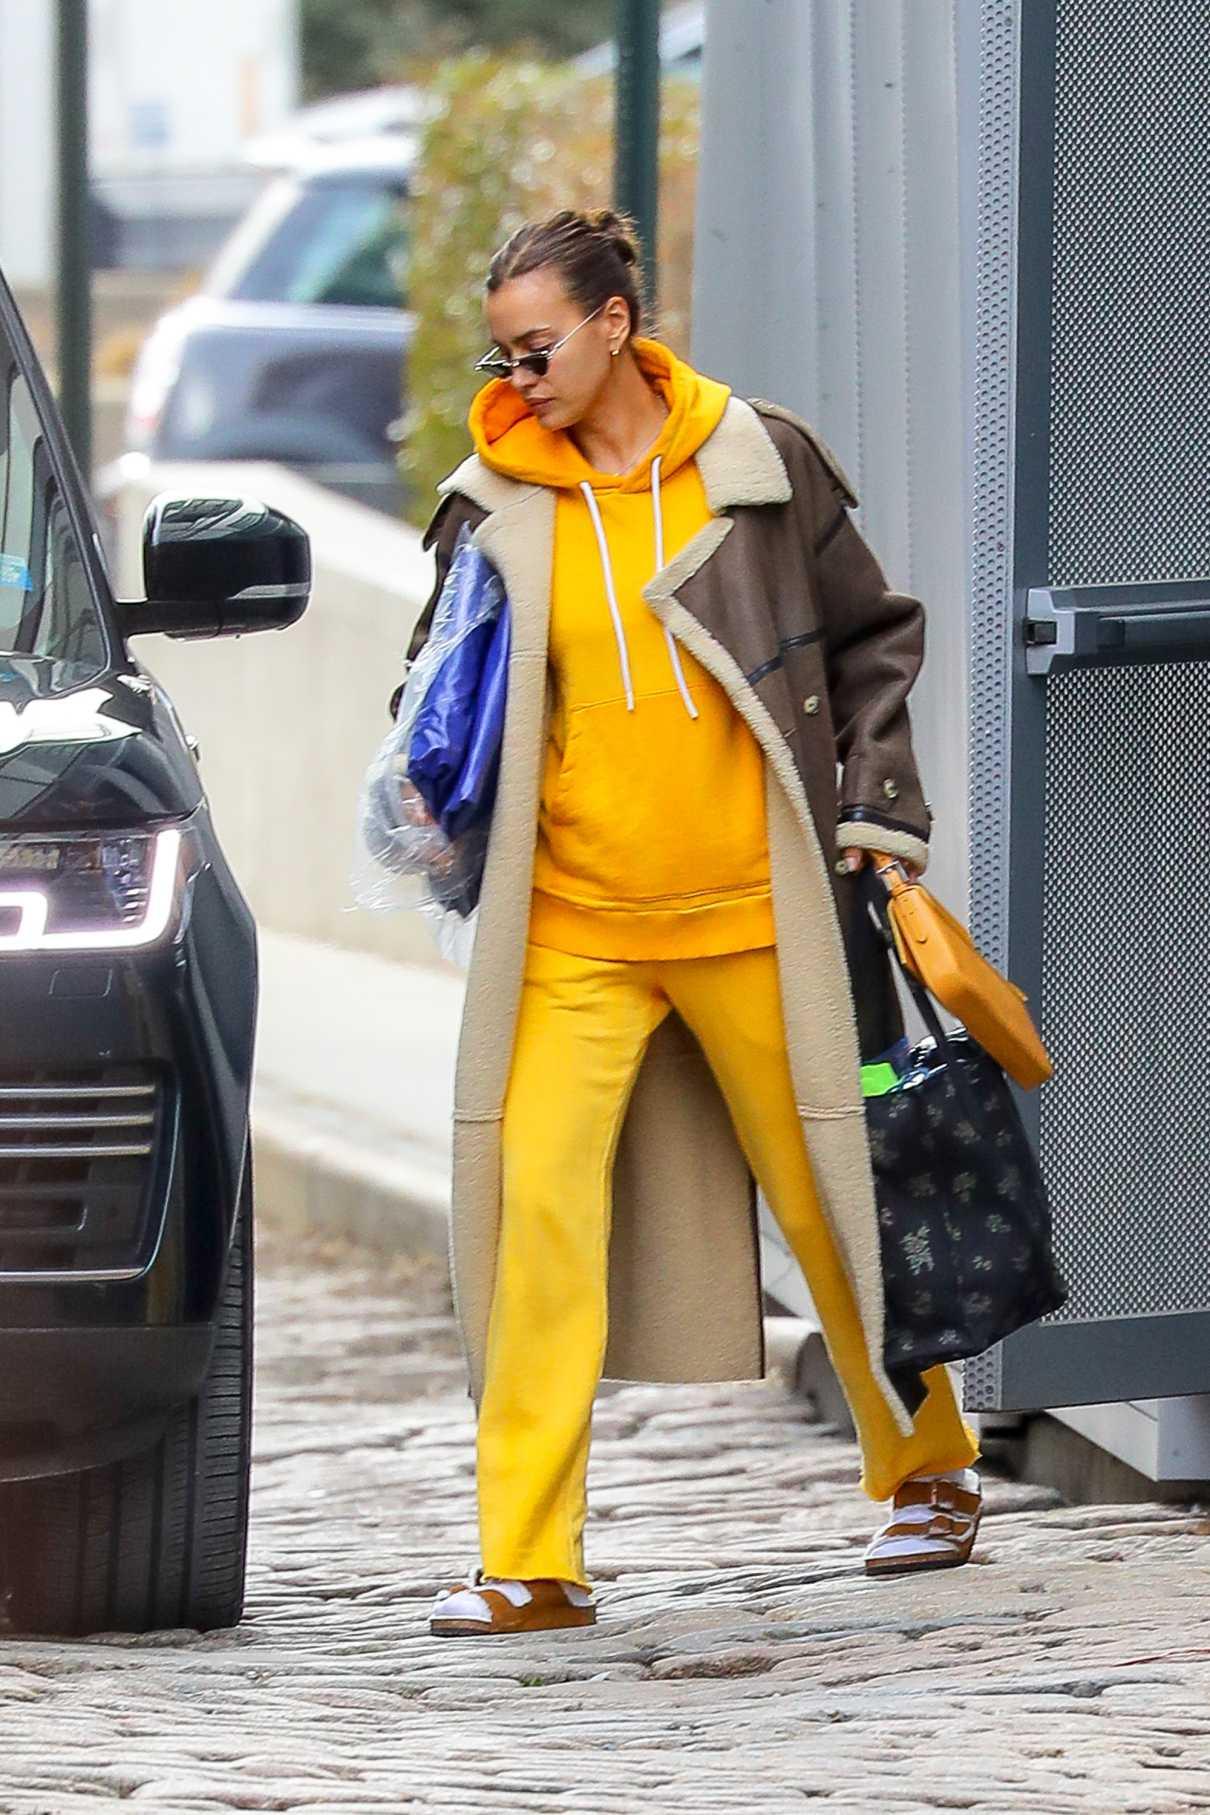 Irina Shayk in a Yellow Sweatsuit